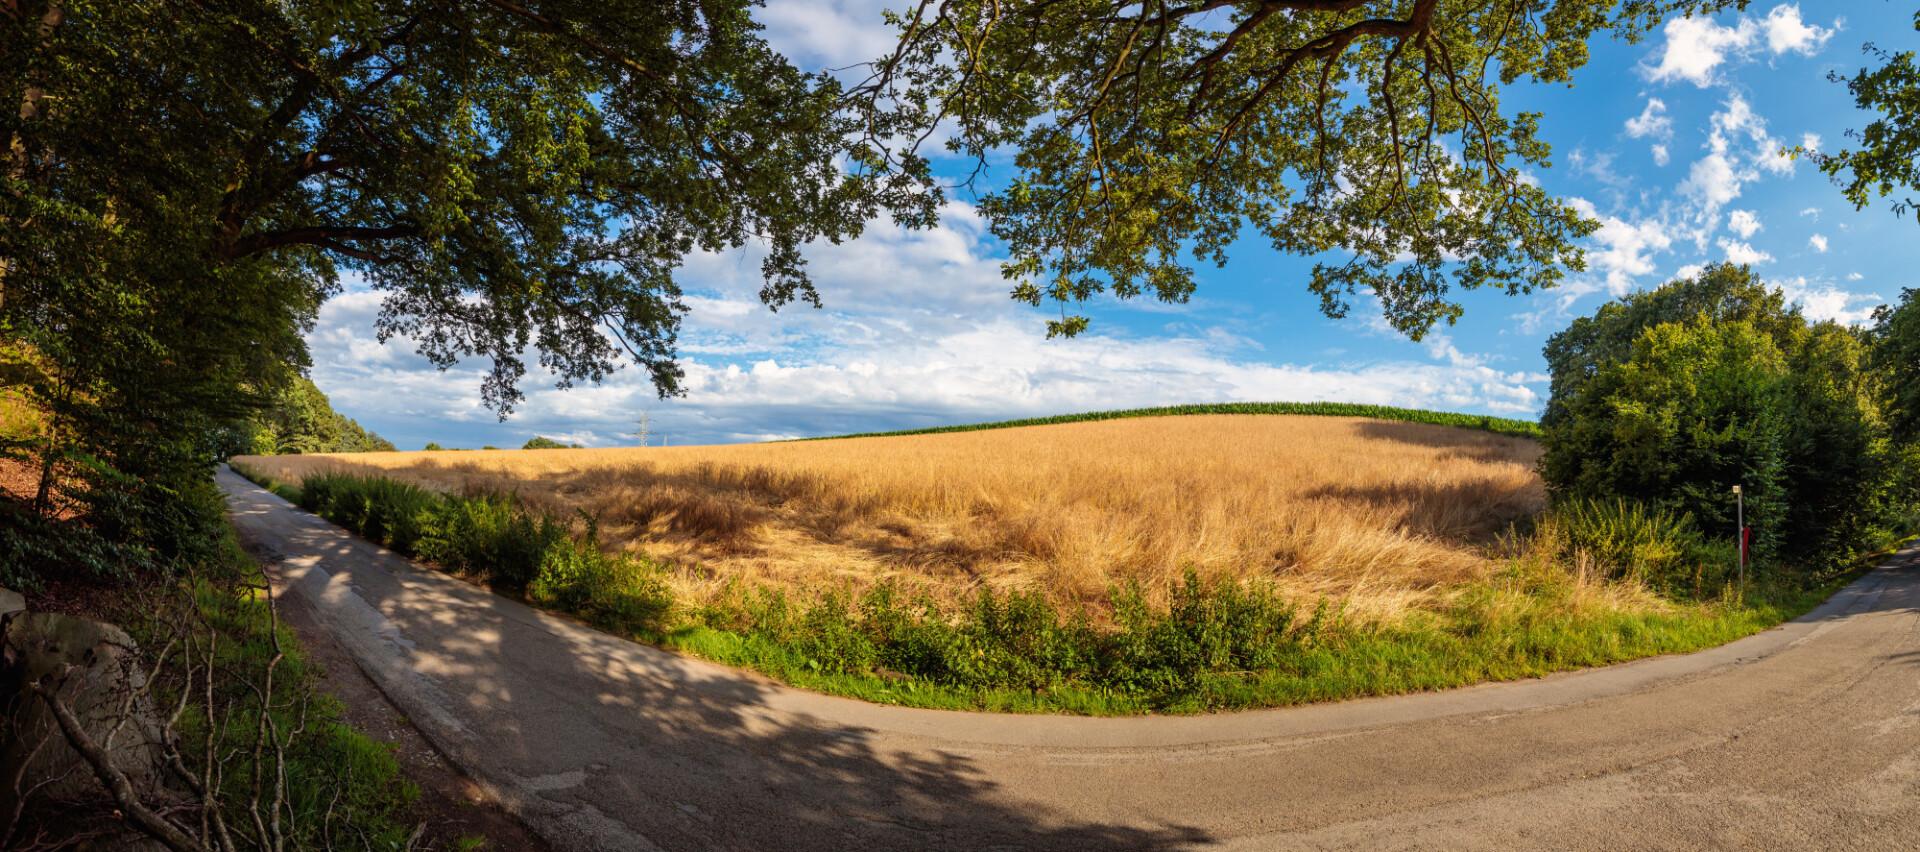 Idyllic German Country Road